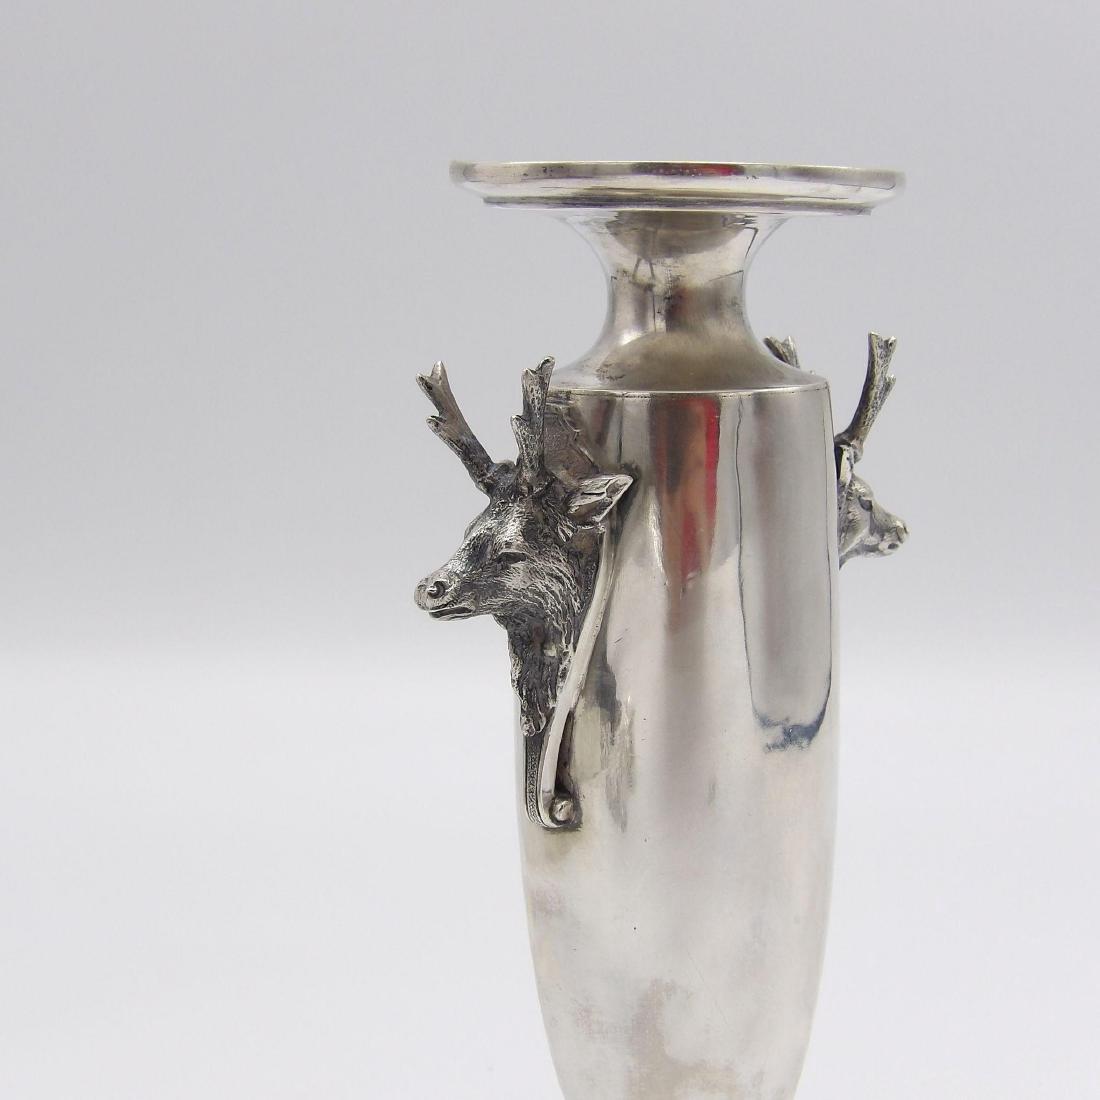 Antique Gorham Saxon Stag Sterling Silver Bud Vase 1860 - 2